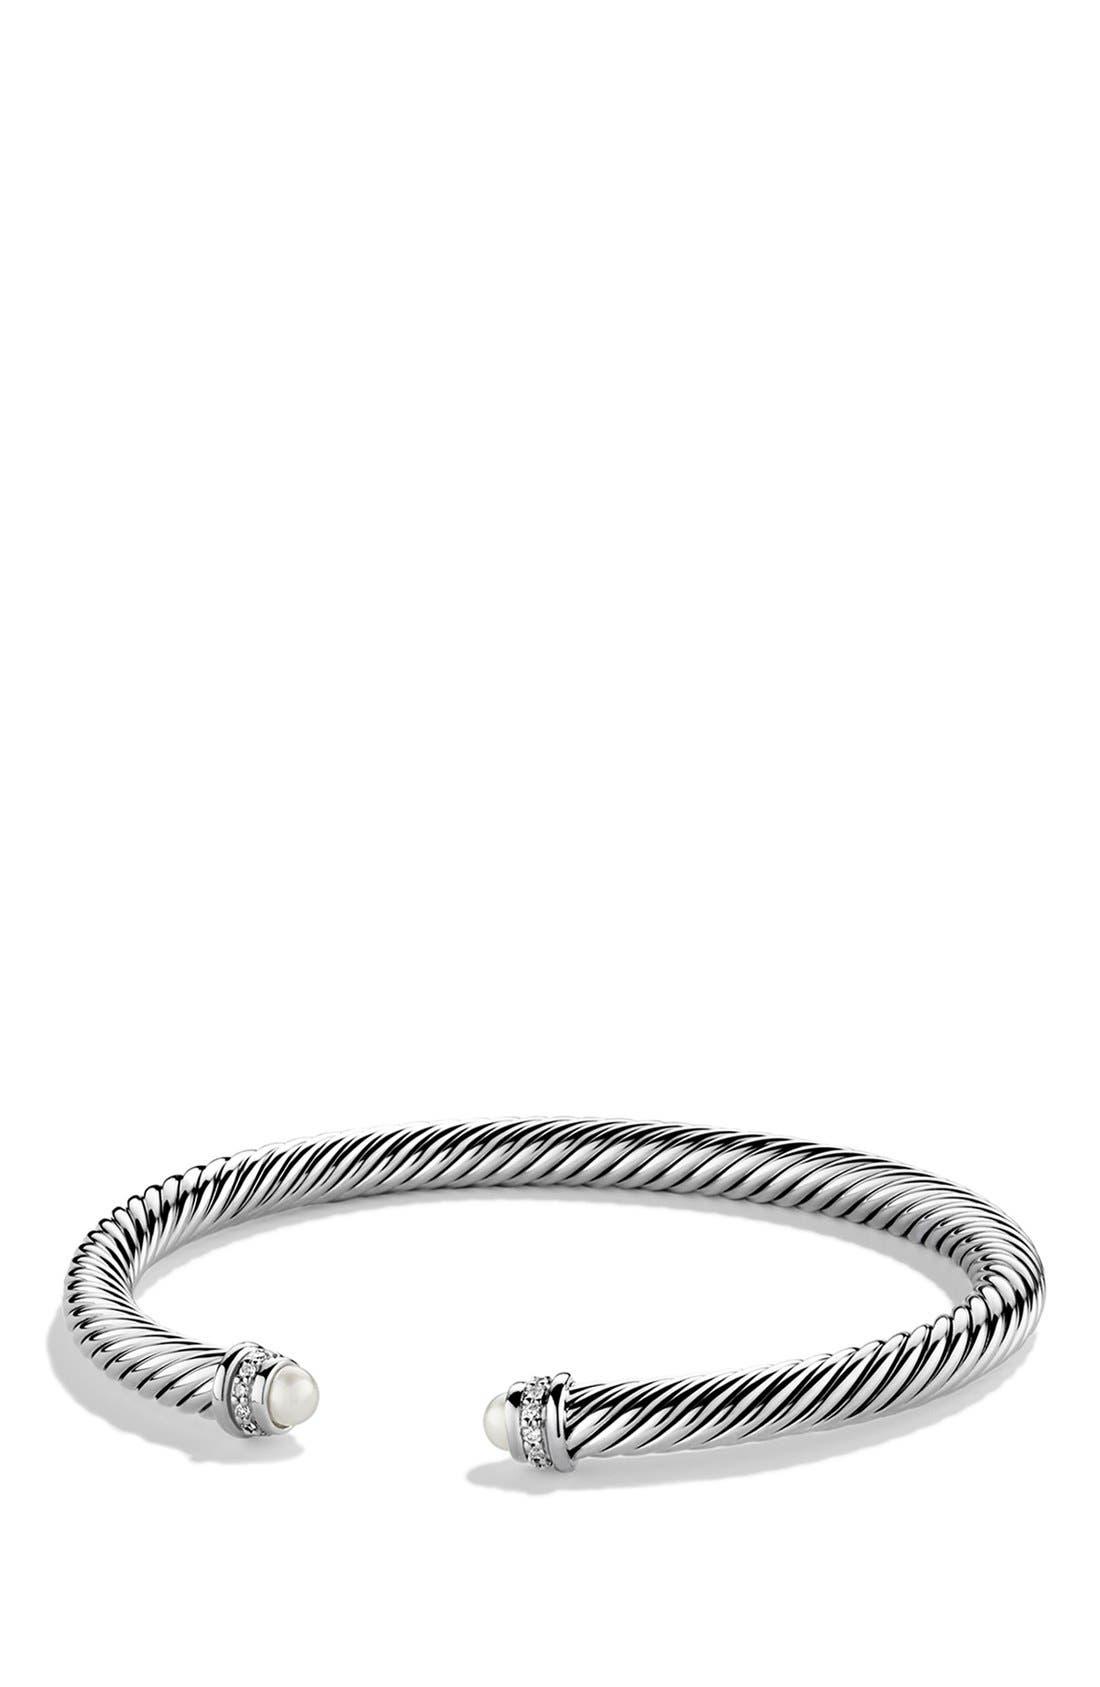 DAVID YURMAN Cable Classics Bracelet with Semiprecious Stones & Diamonds, 5mm, Main, color, PEARL